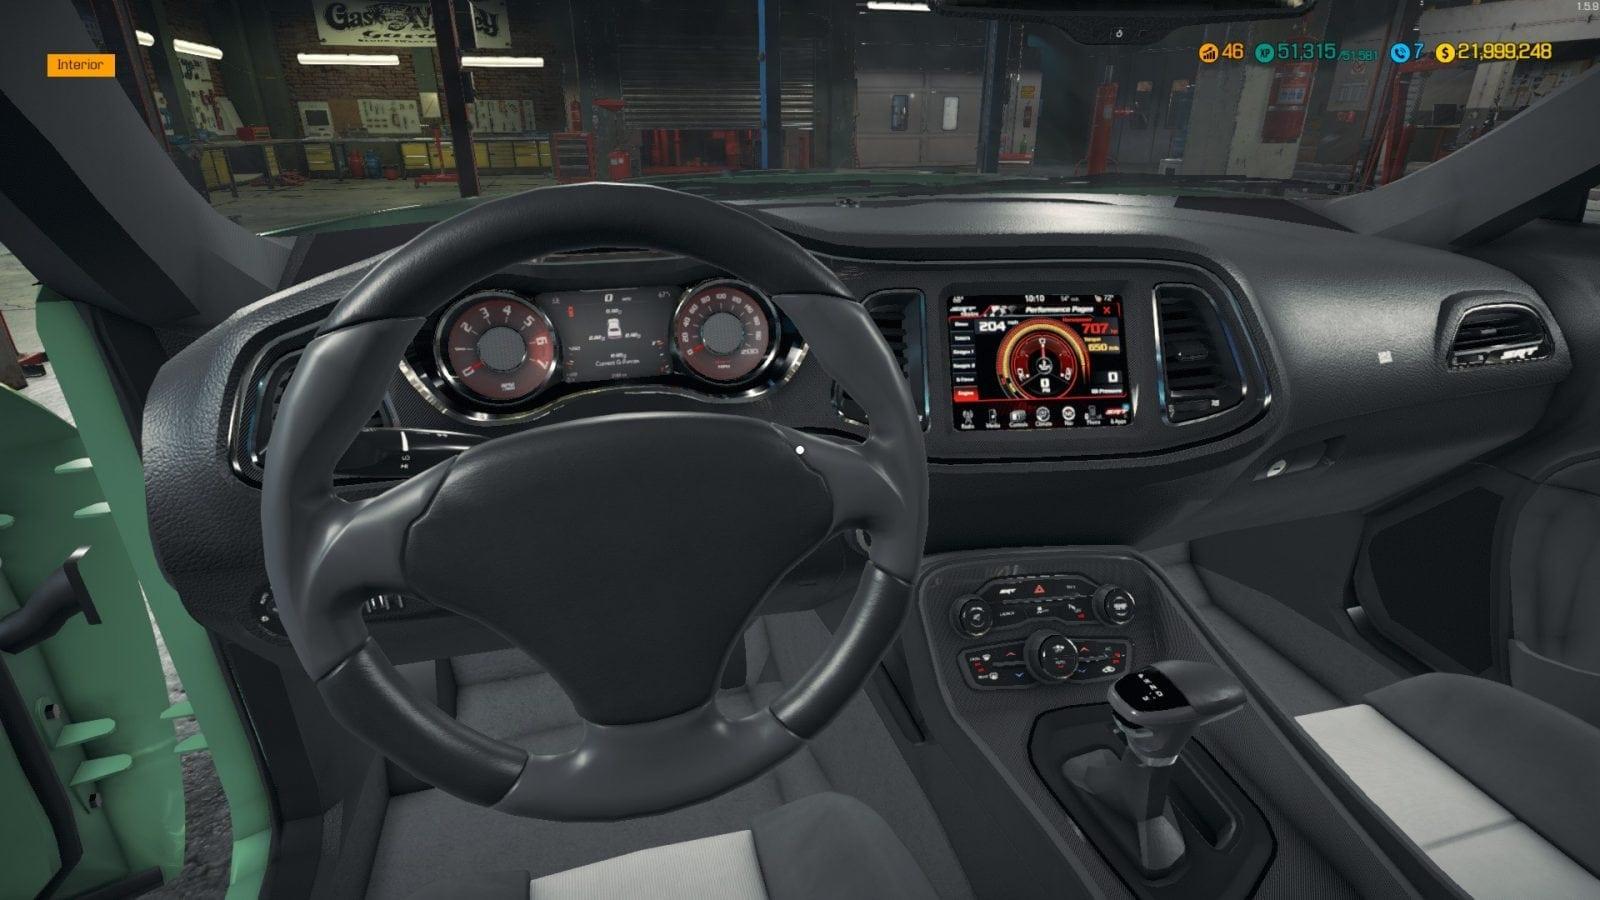 Dodge Challenger Hellcat Mod for Car Mechanic Simulator 2018